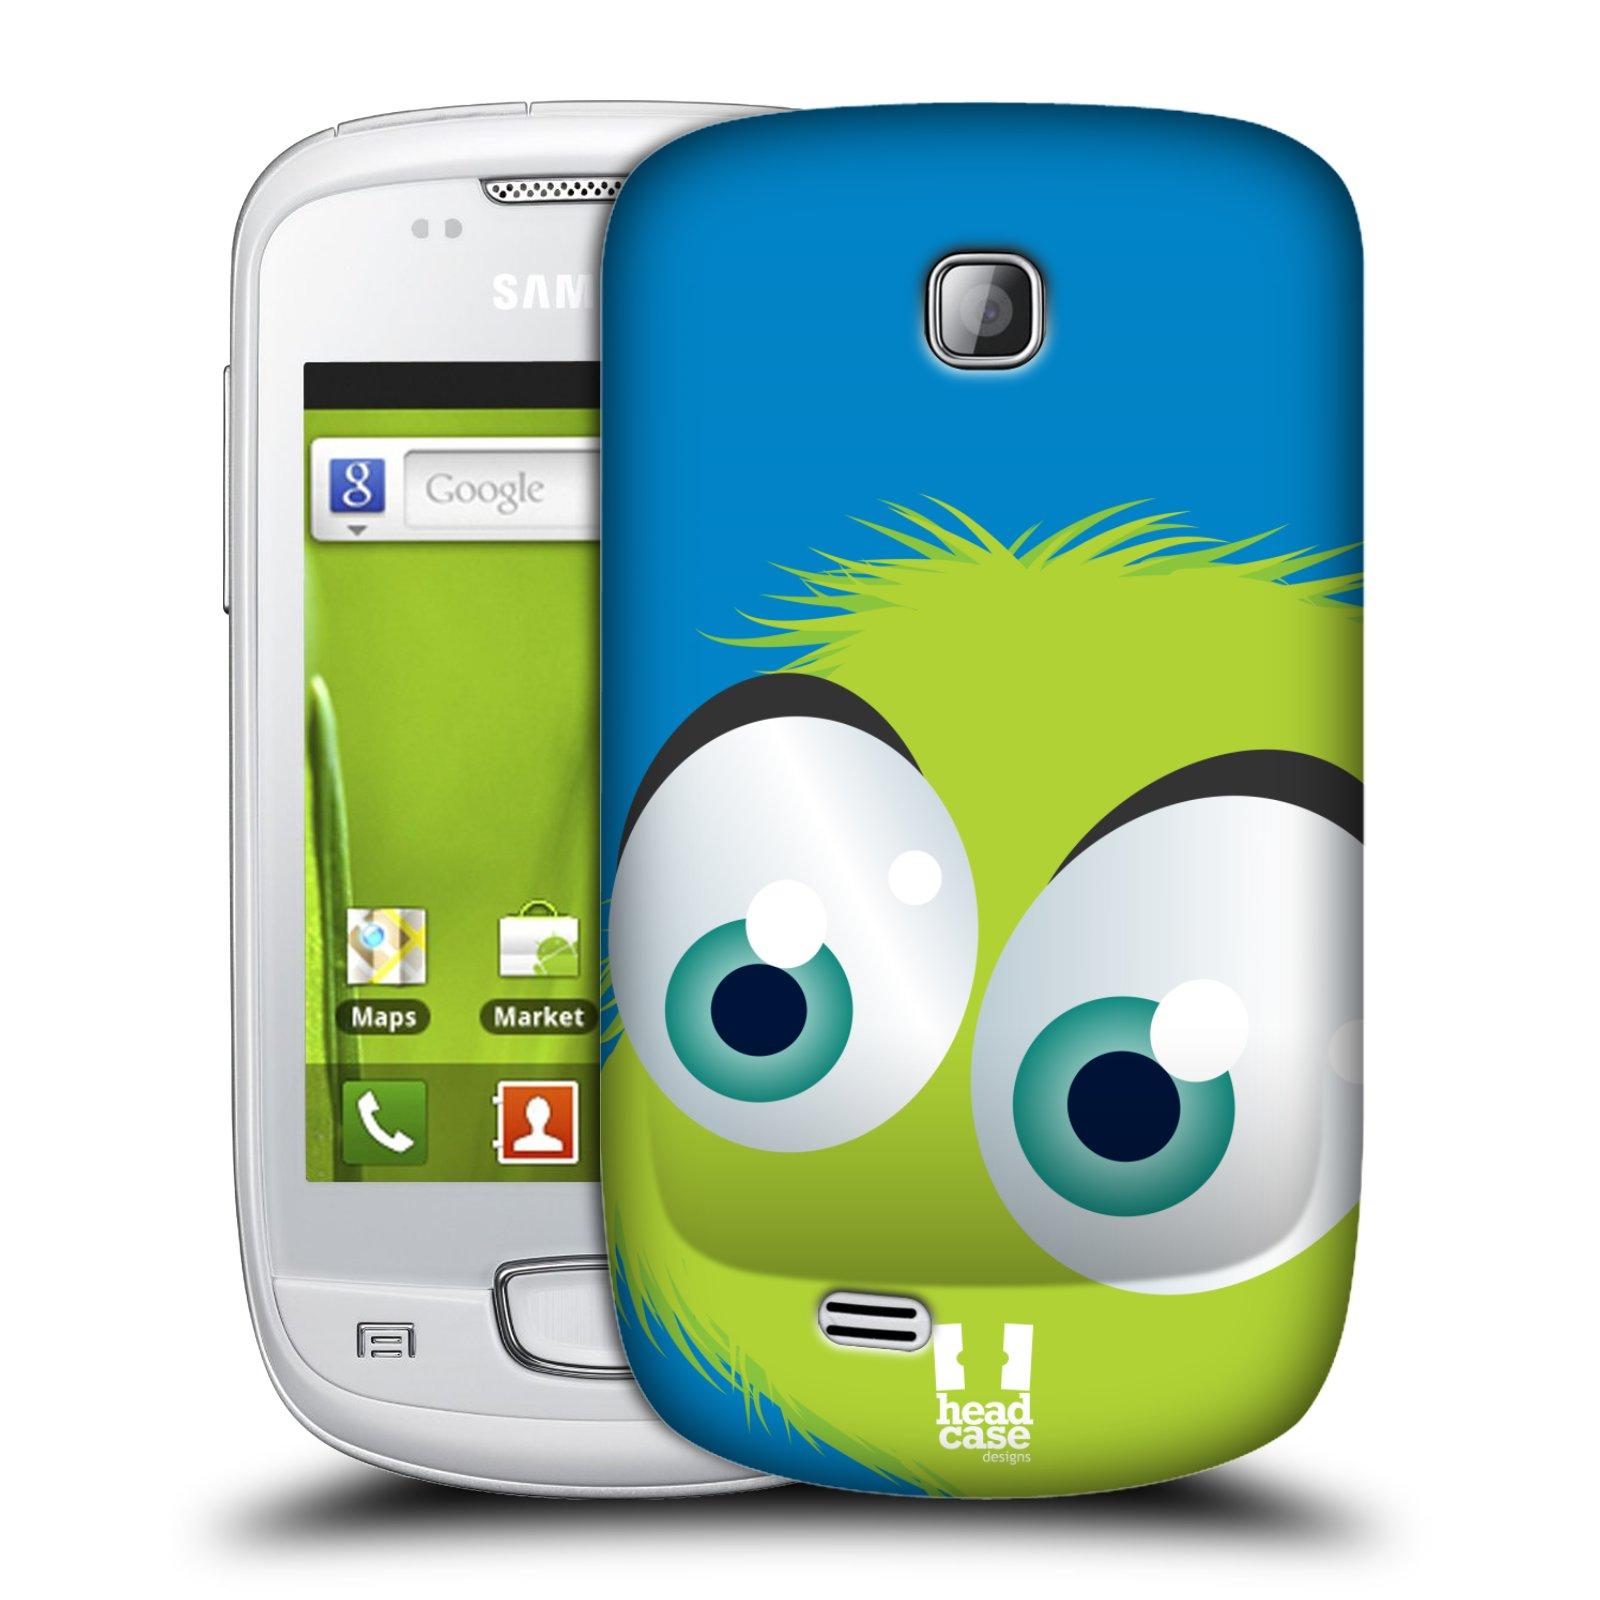 Plastové pouzdro na mobil Samsung Galaxy Mini HEAD CASE FUZÍK ZELENÝ (Kryt či obal na mobilní telefon Samsung Galaxy Mini GT-S5570 / GT-S5570i)